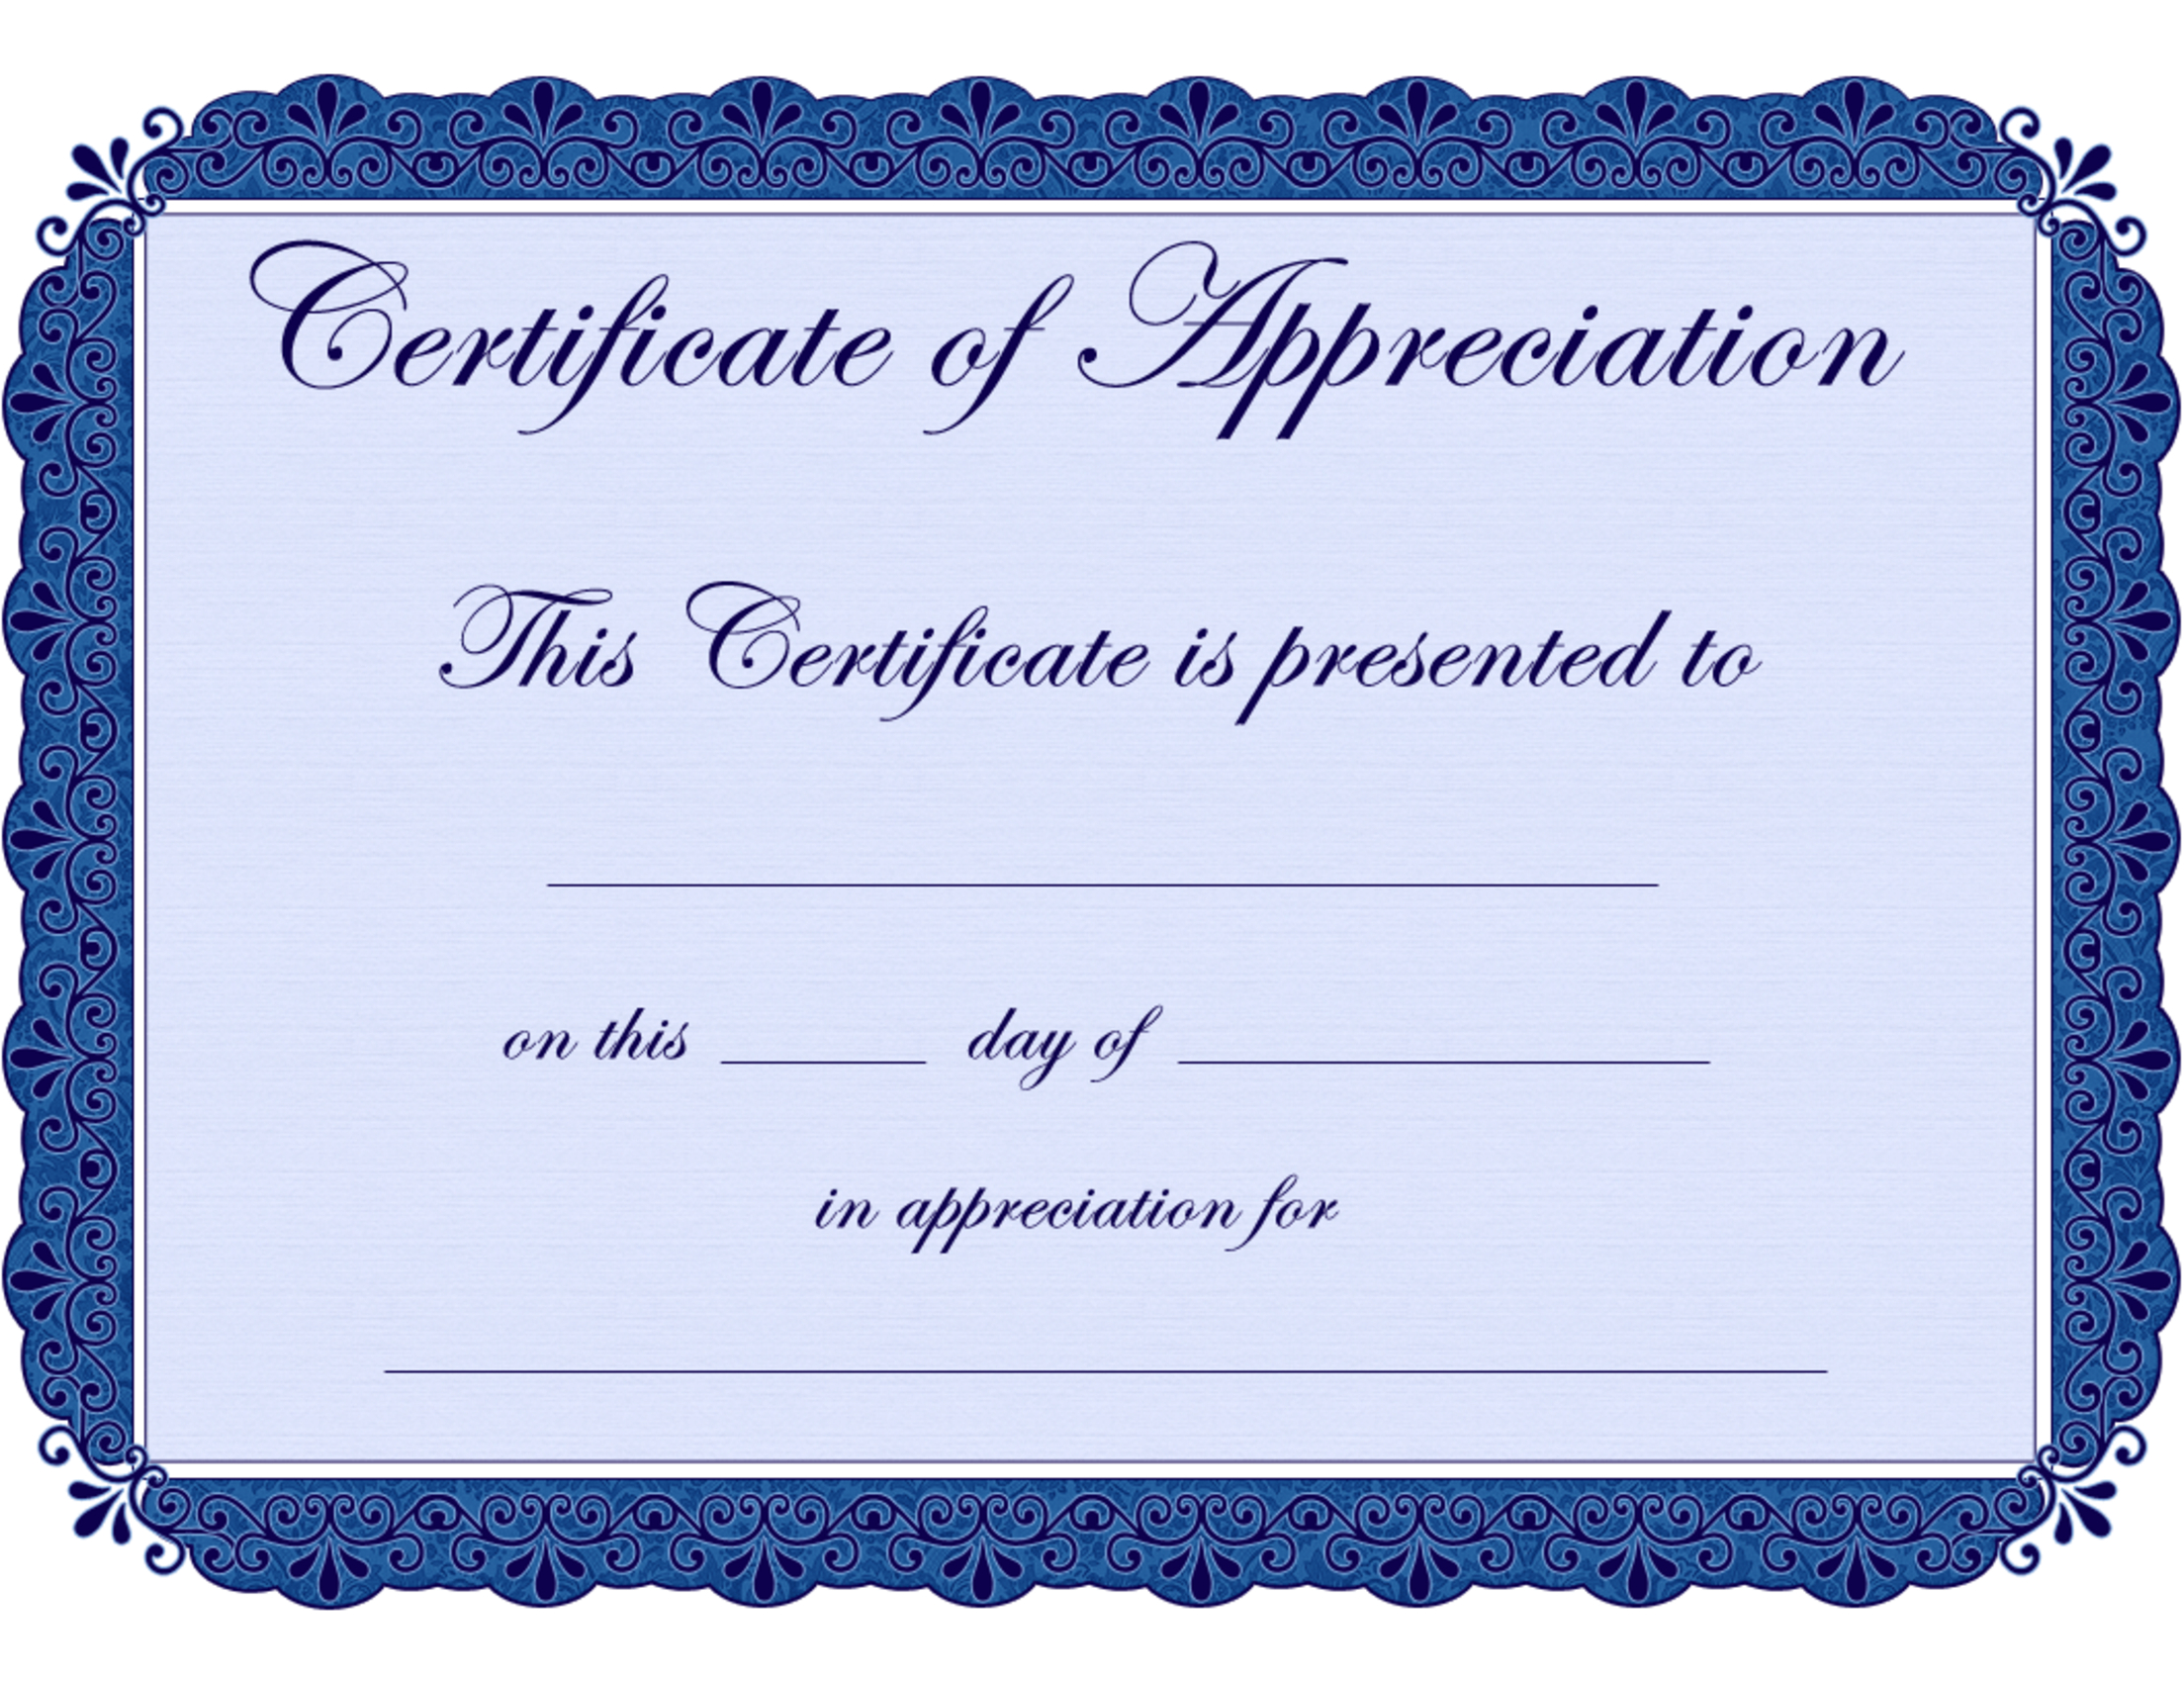 Free Printable Certificates Certificate Of Appreciation With Certificate Of Appreciation Template Free Printable